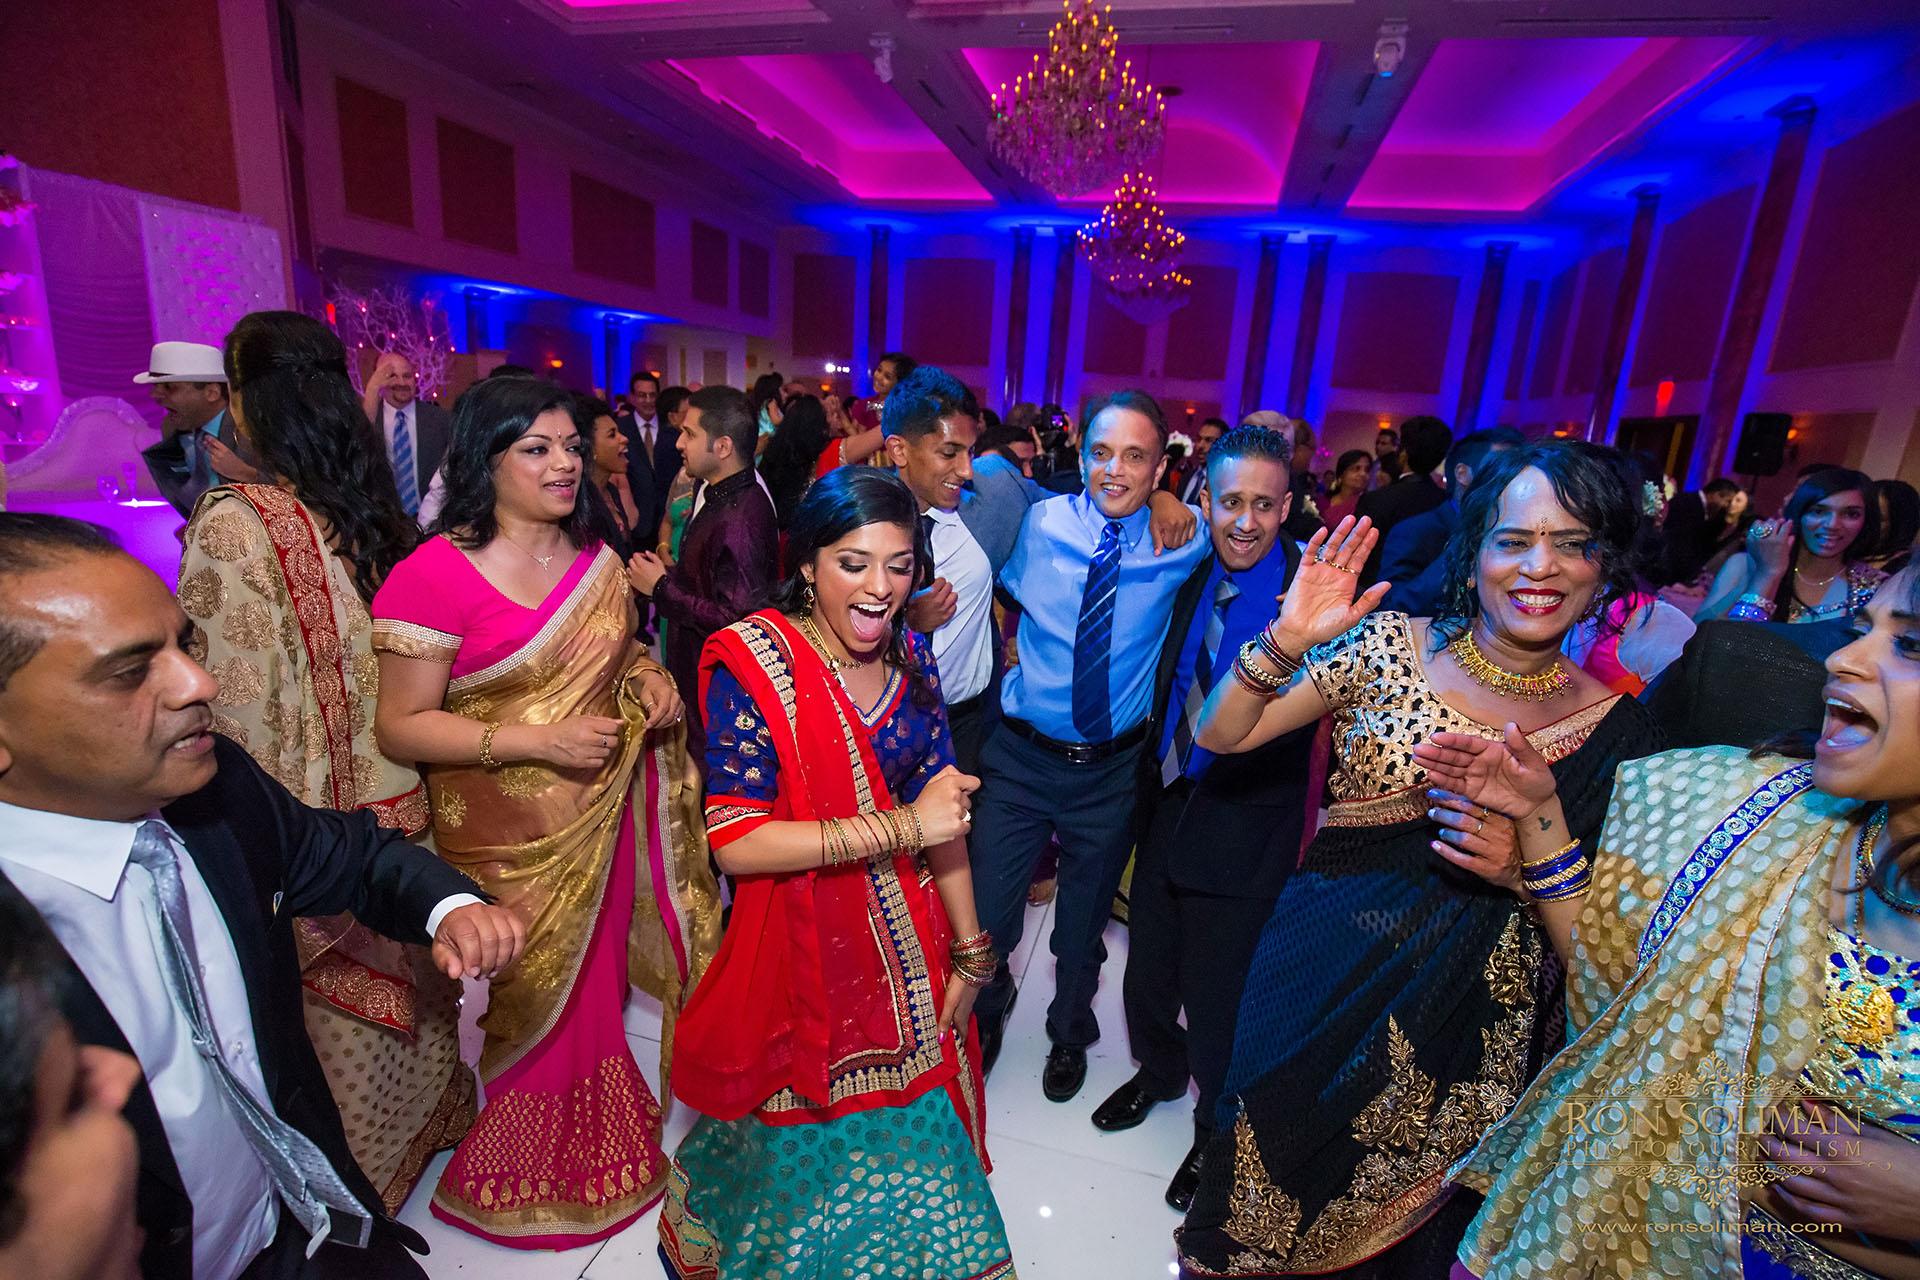 Indian wedding receptio at The Merion